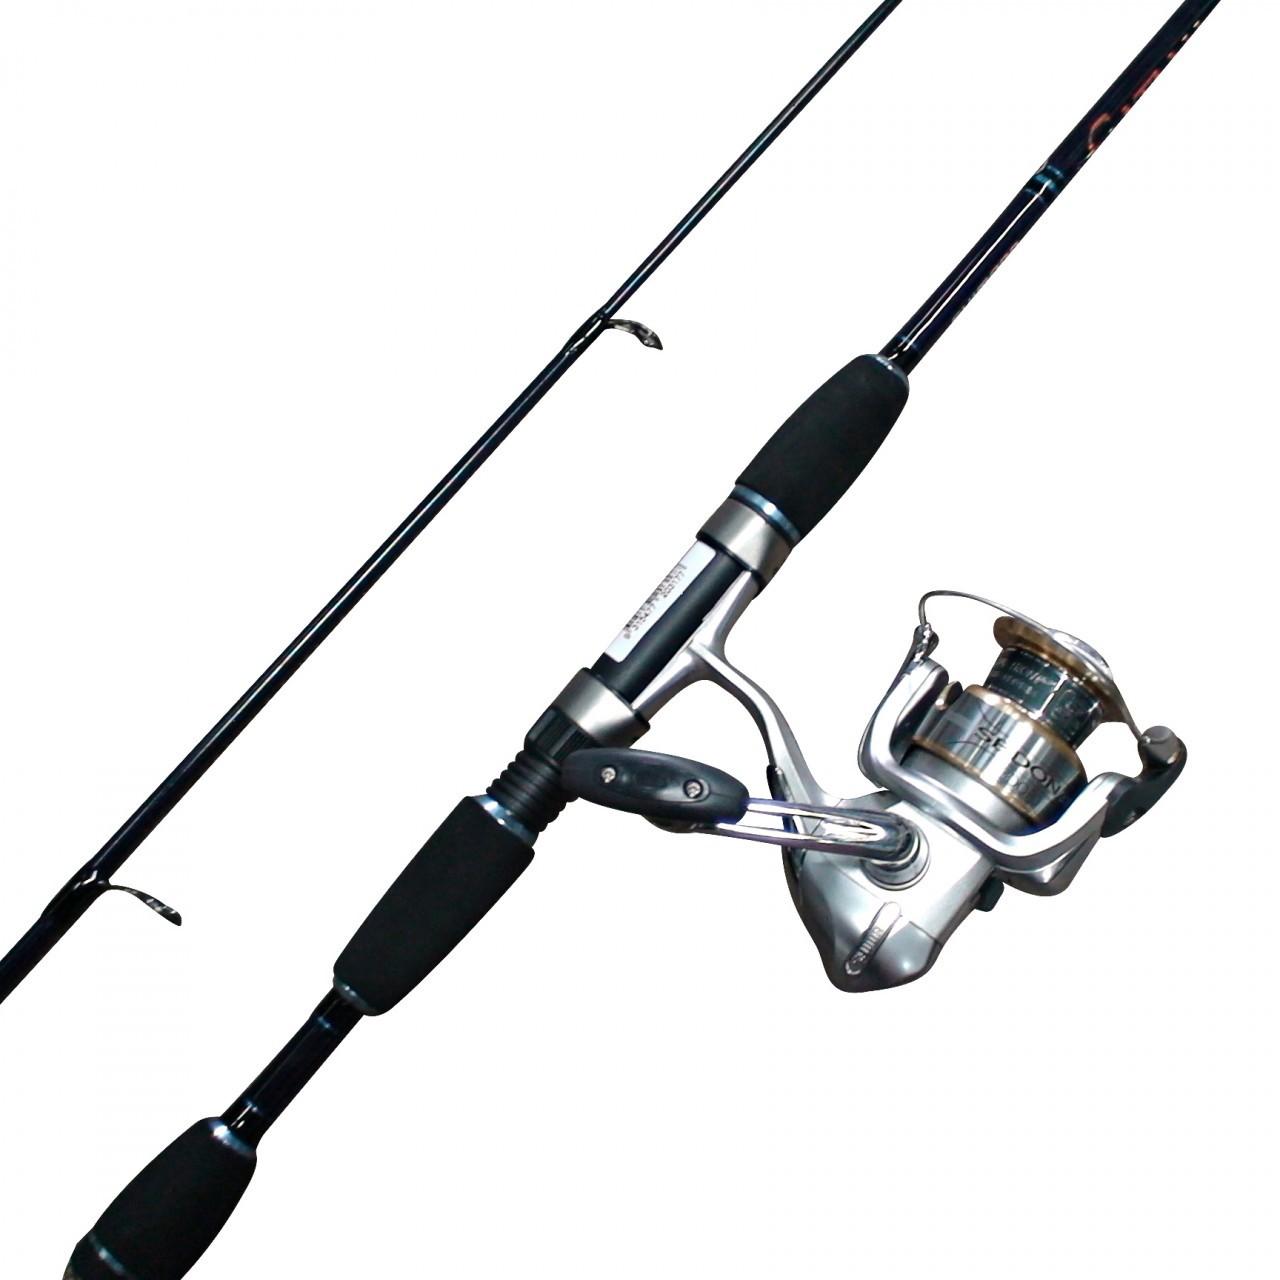 fishing rod sketch - photo #28